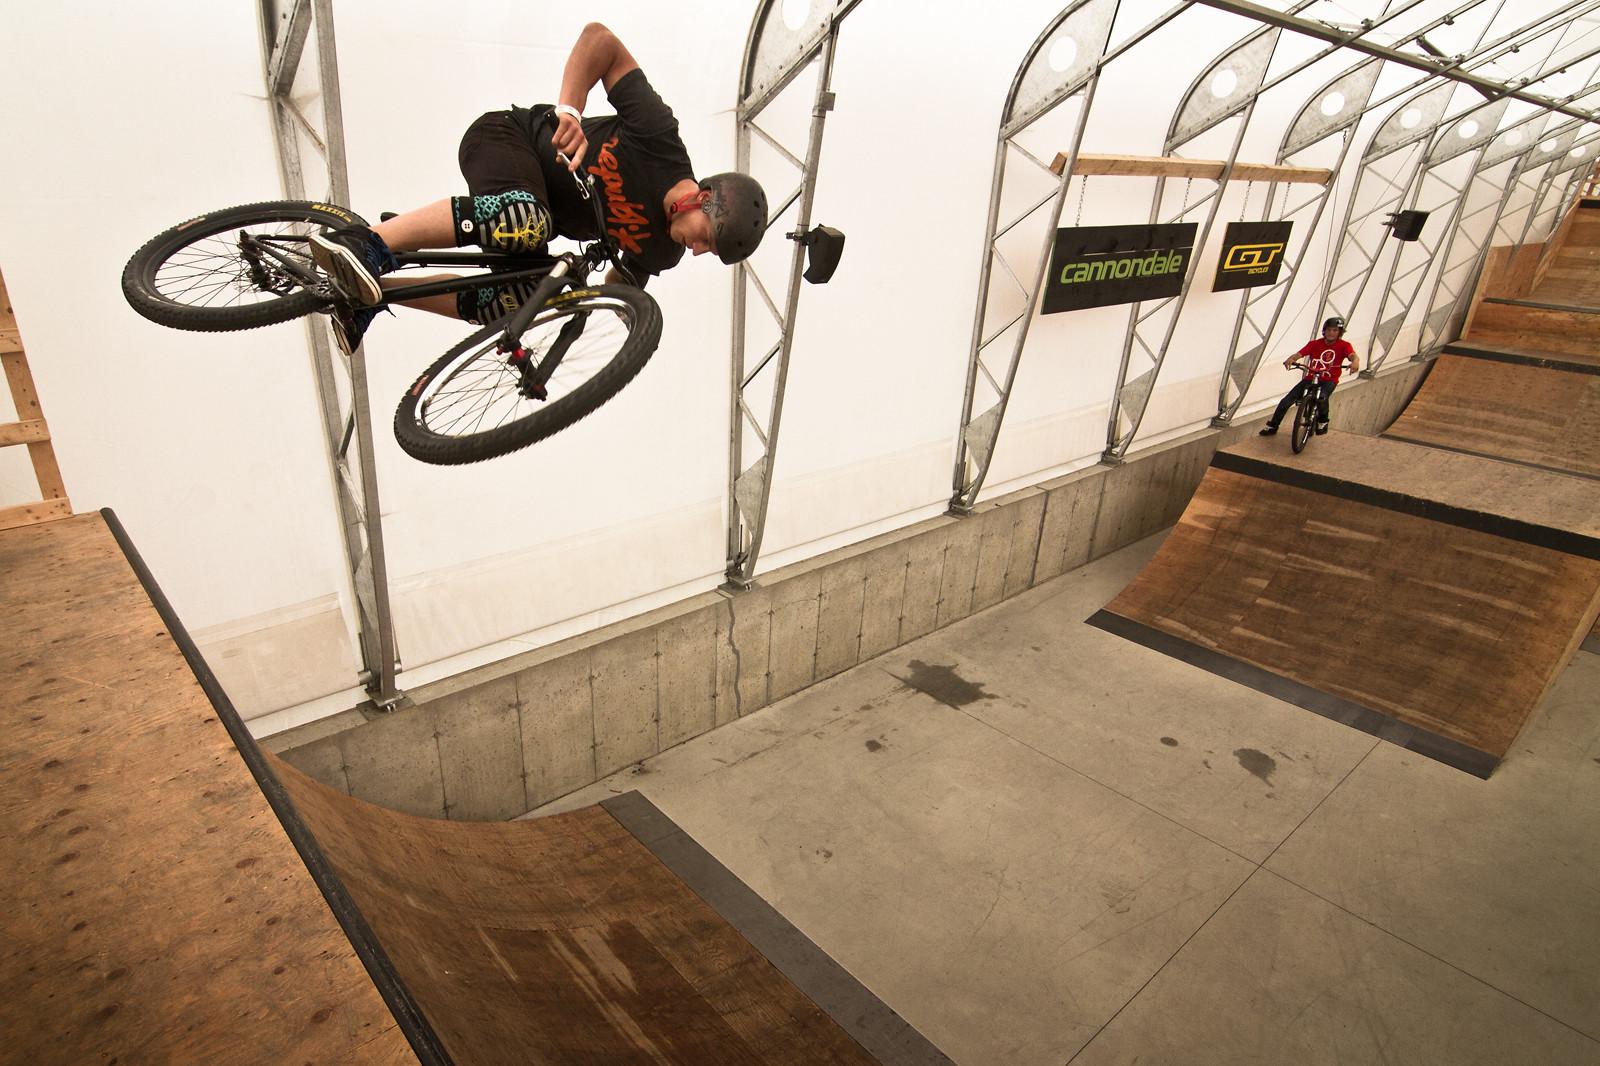 Dustin Gilding - Smutok - Mountain Biking Pictures - Vital MTB